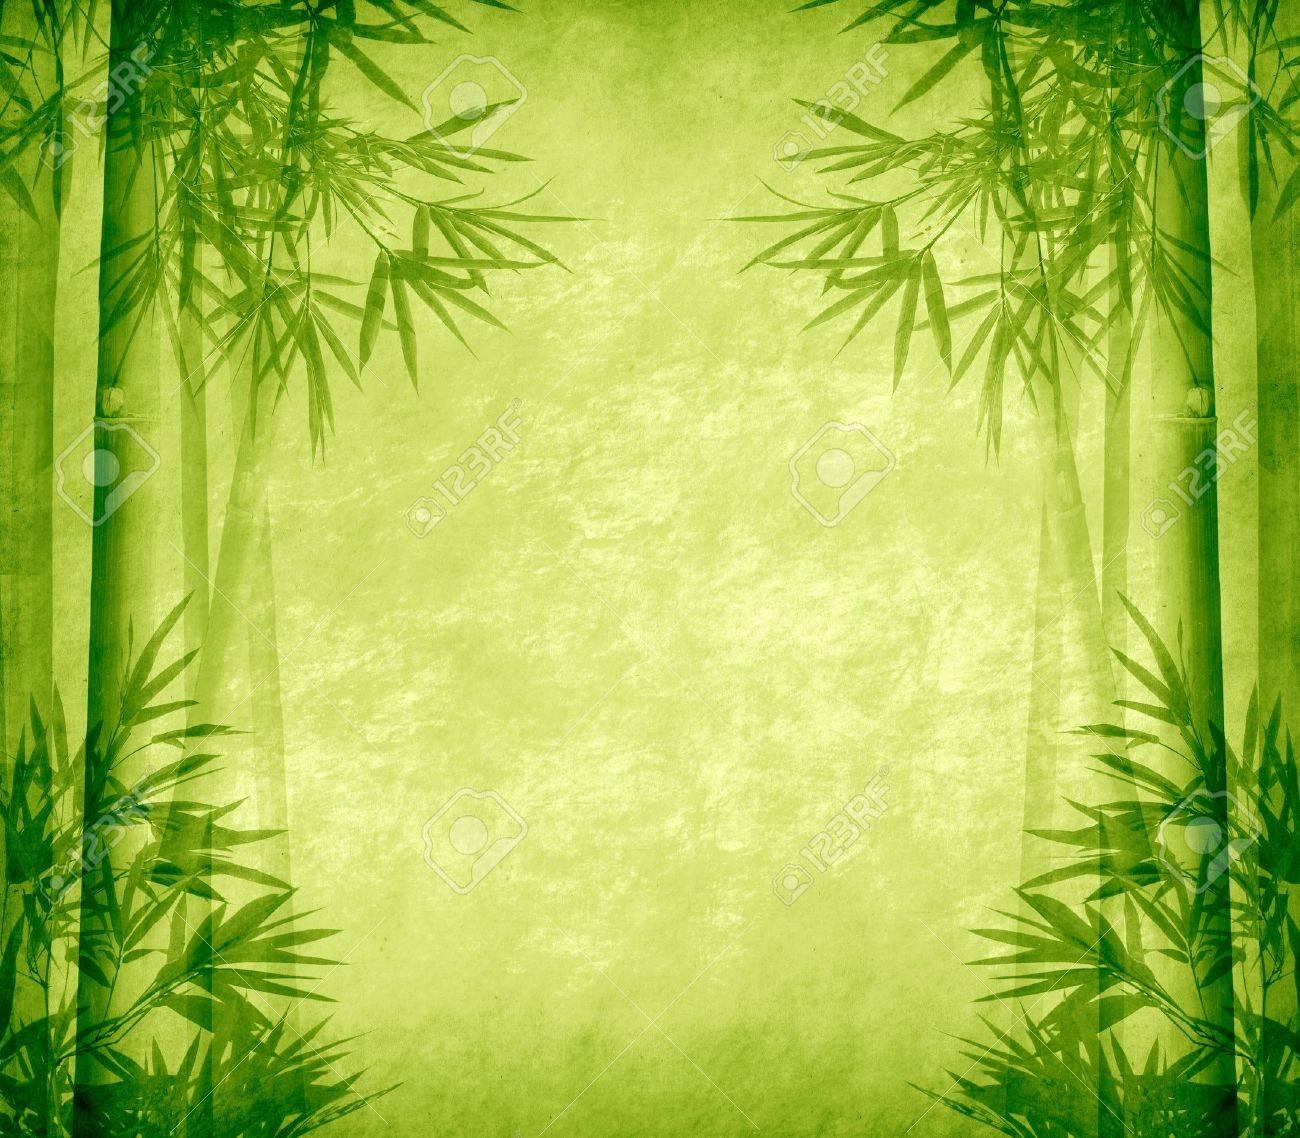 Bamboo Paper Texture Texture of Handmade Paper